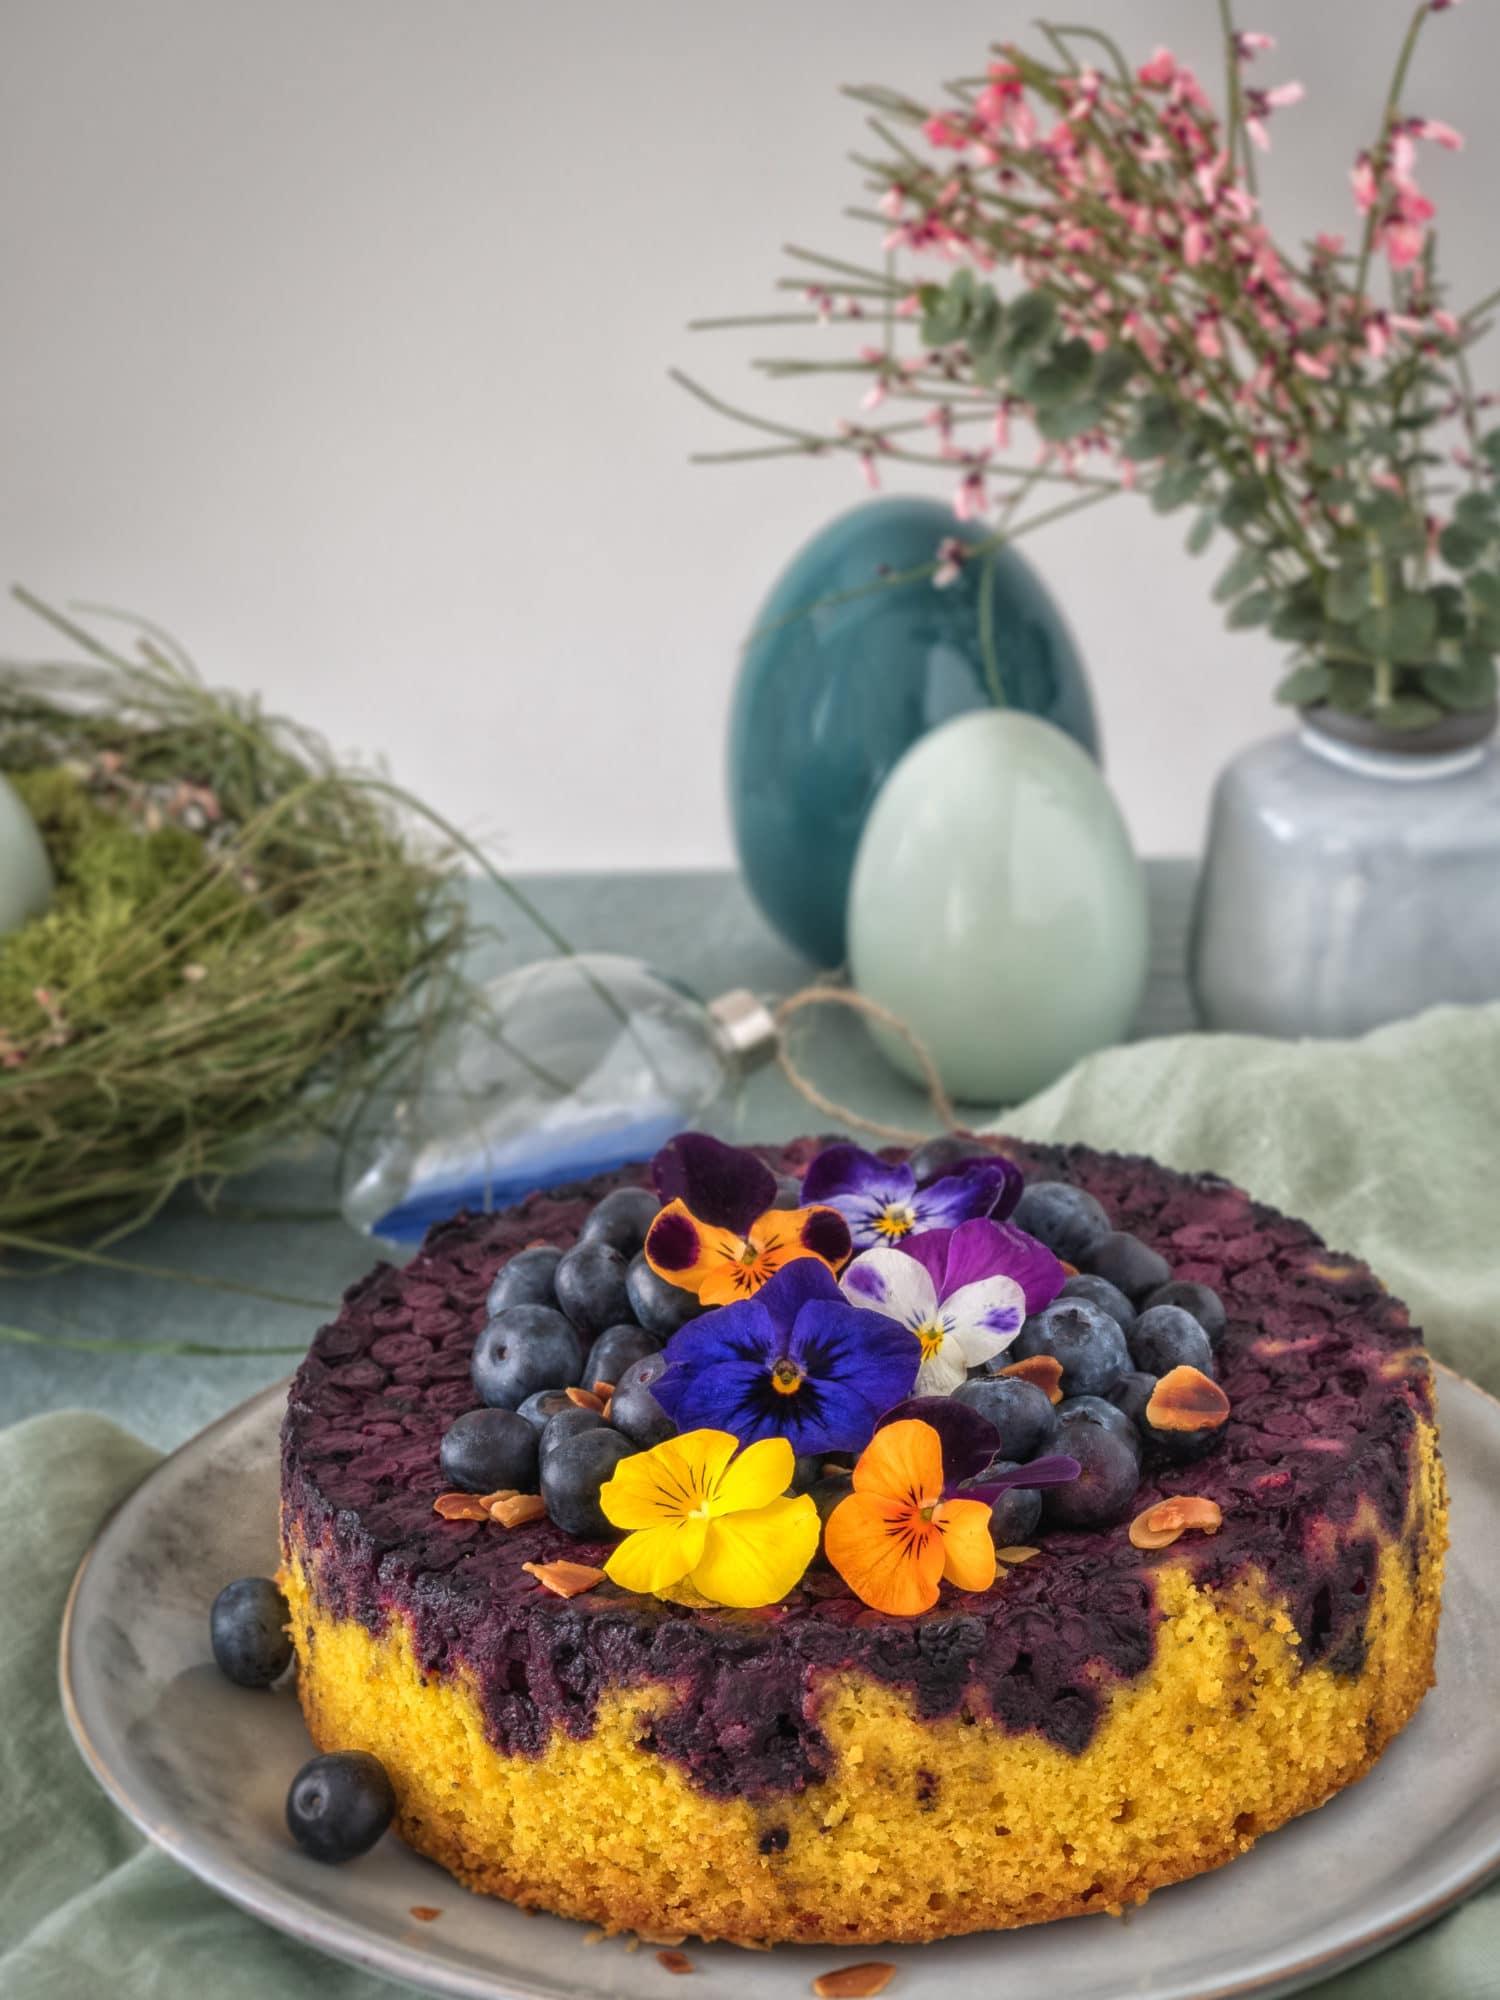 Kurkuma Kuchen mit Blaubeeren